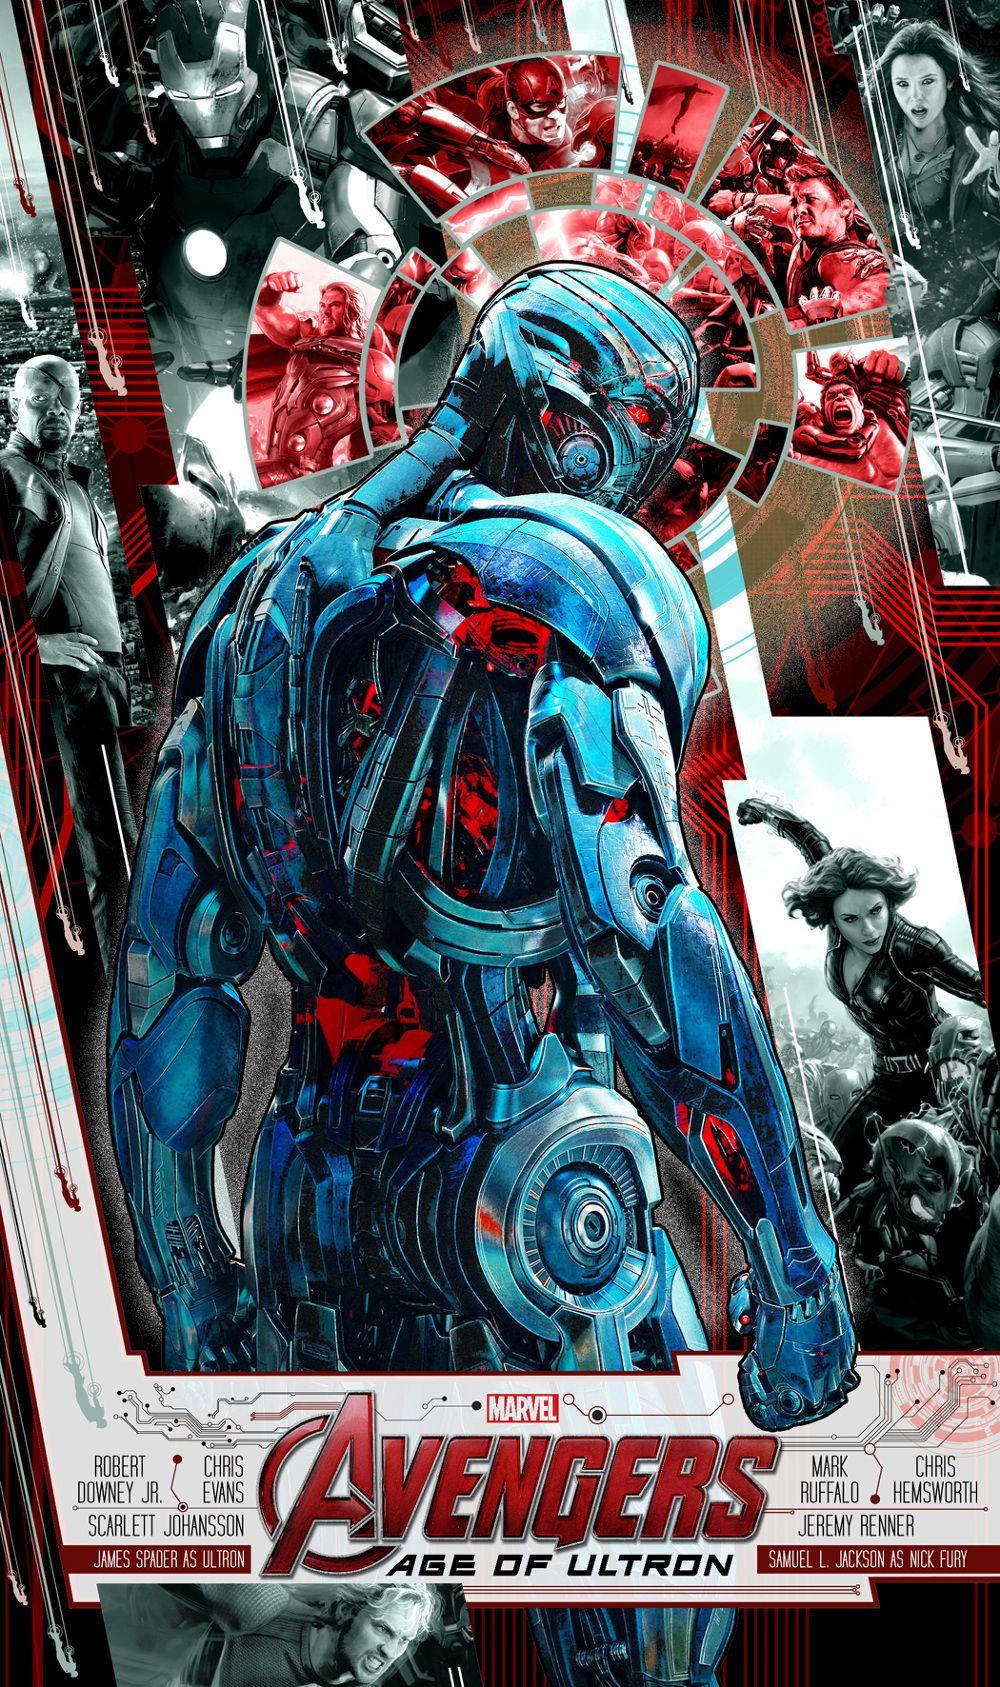 Pin by Ignacio Quintana on Movies IMDB Avengers poster